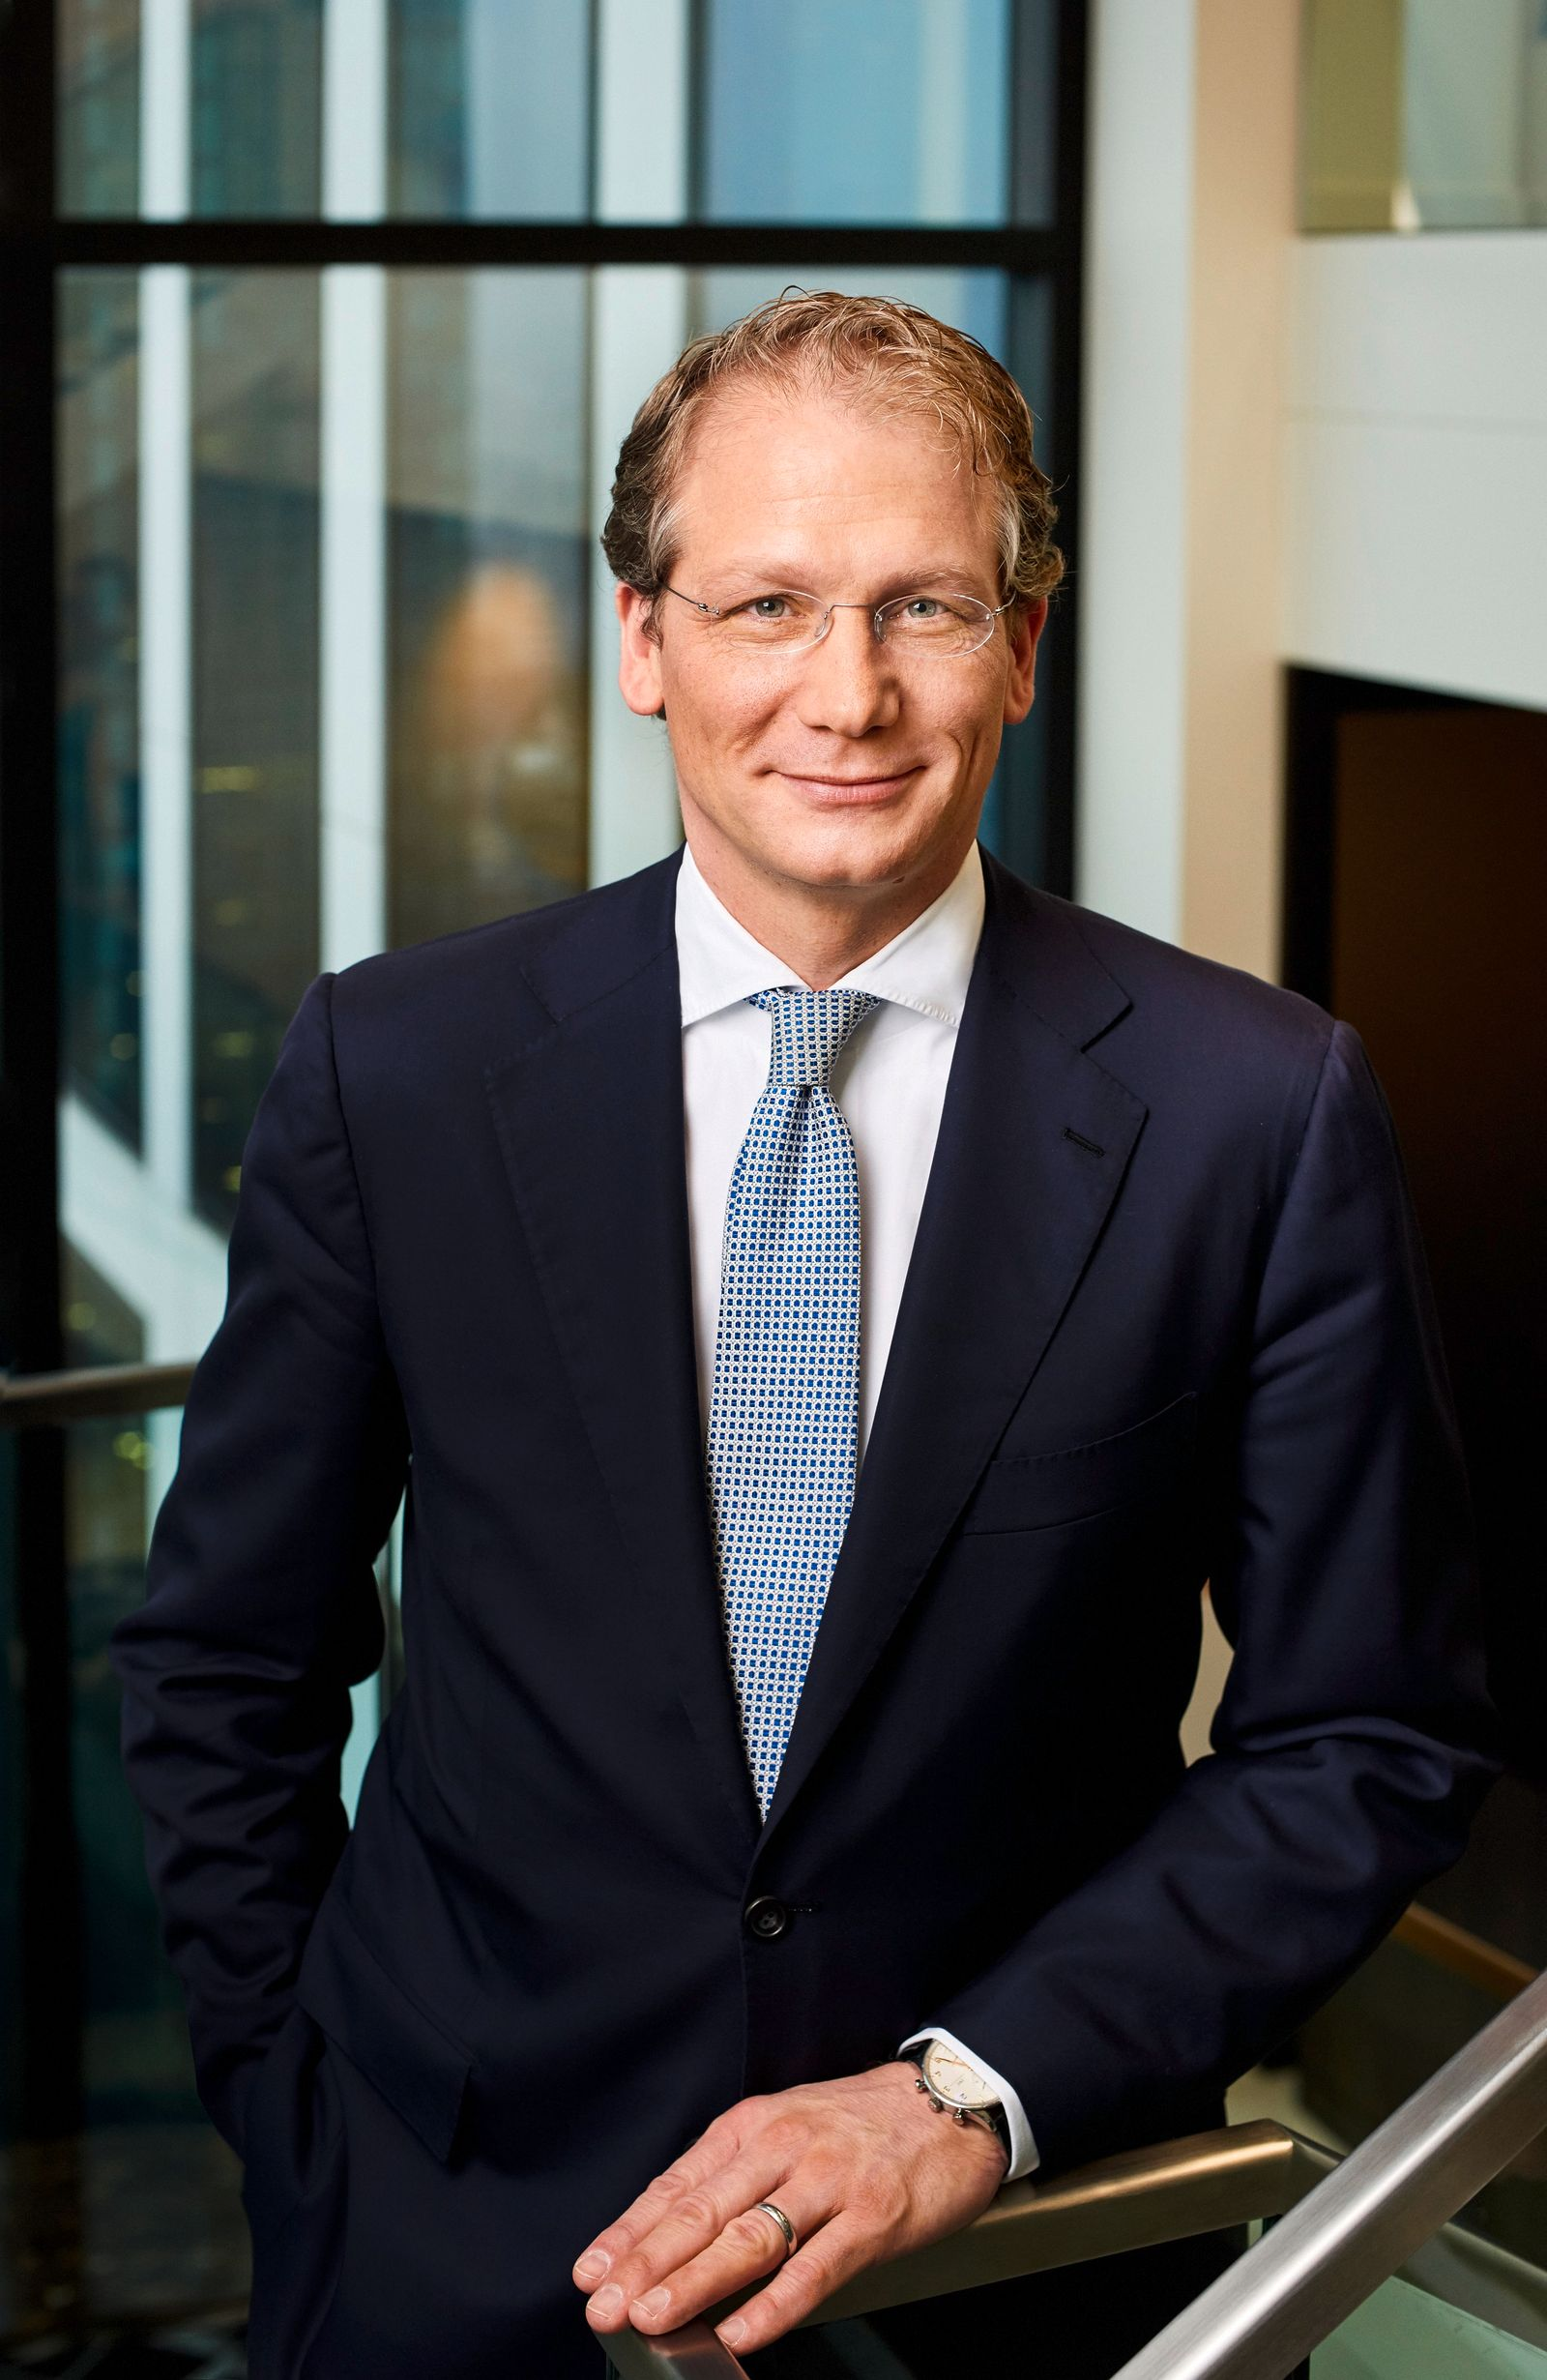 Christian Kames / JPMorgan